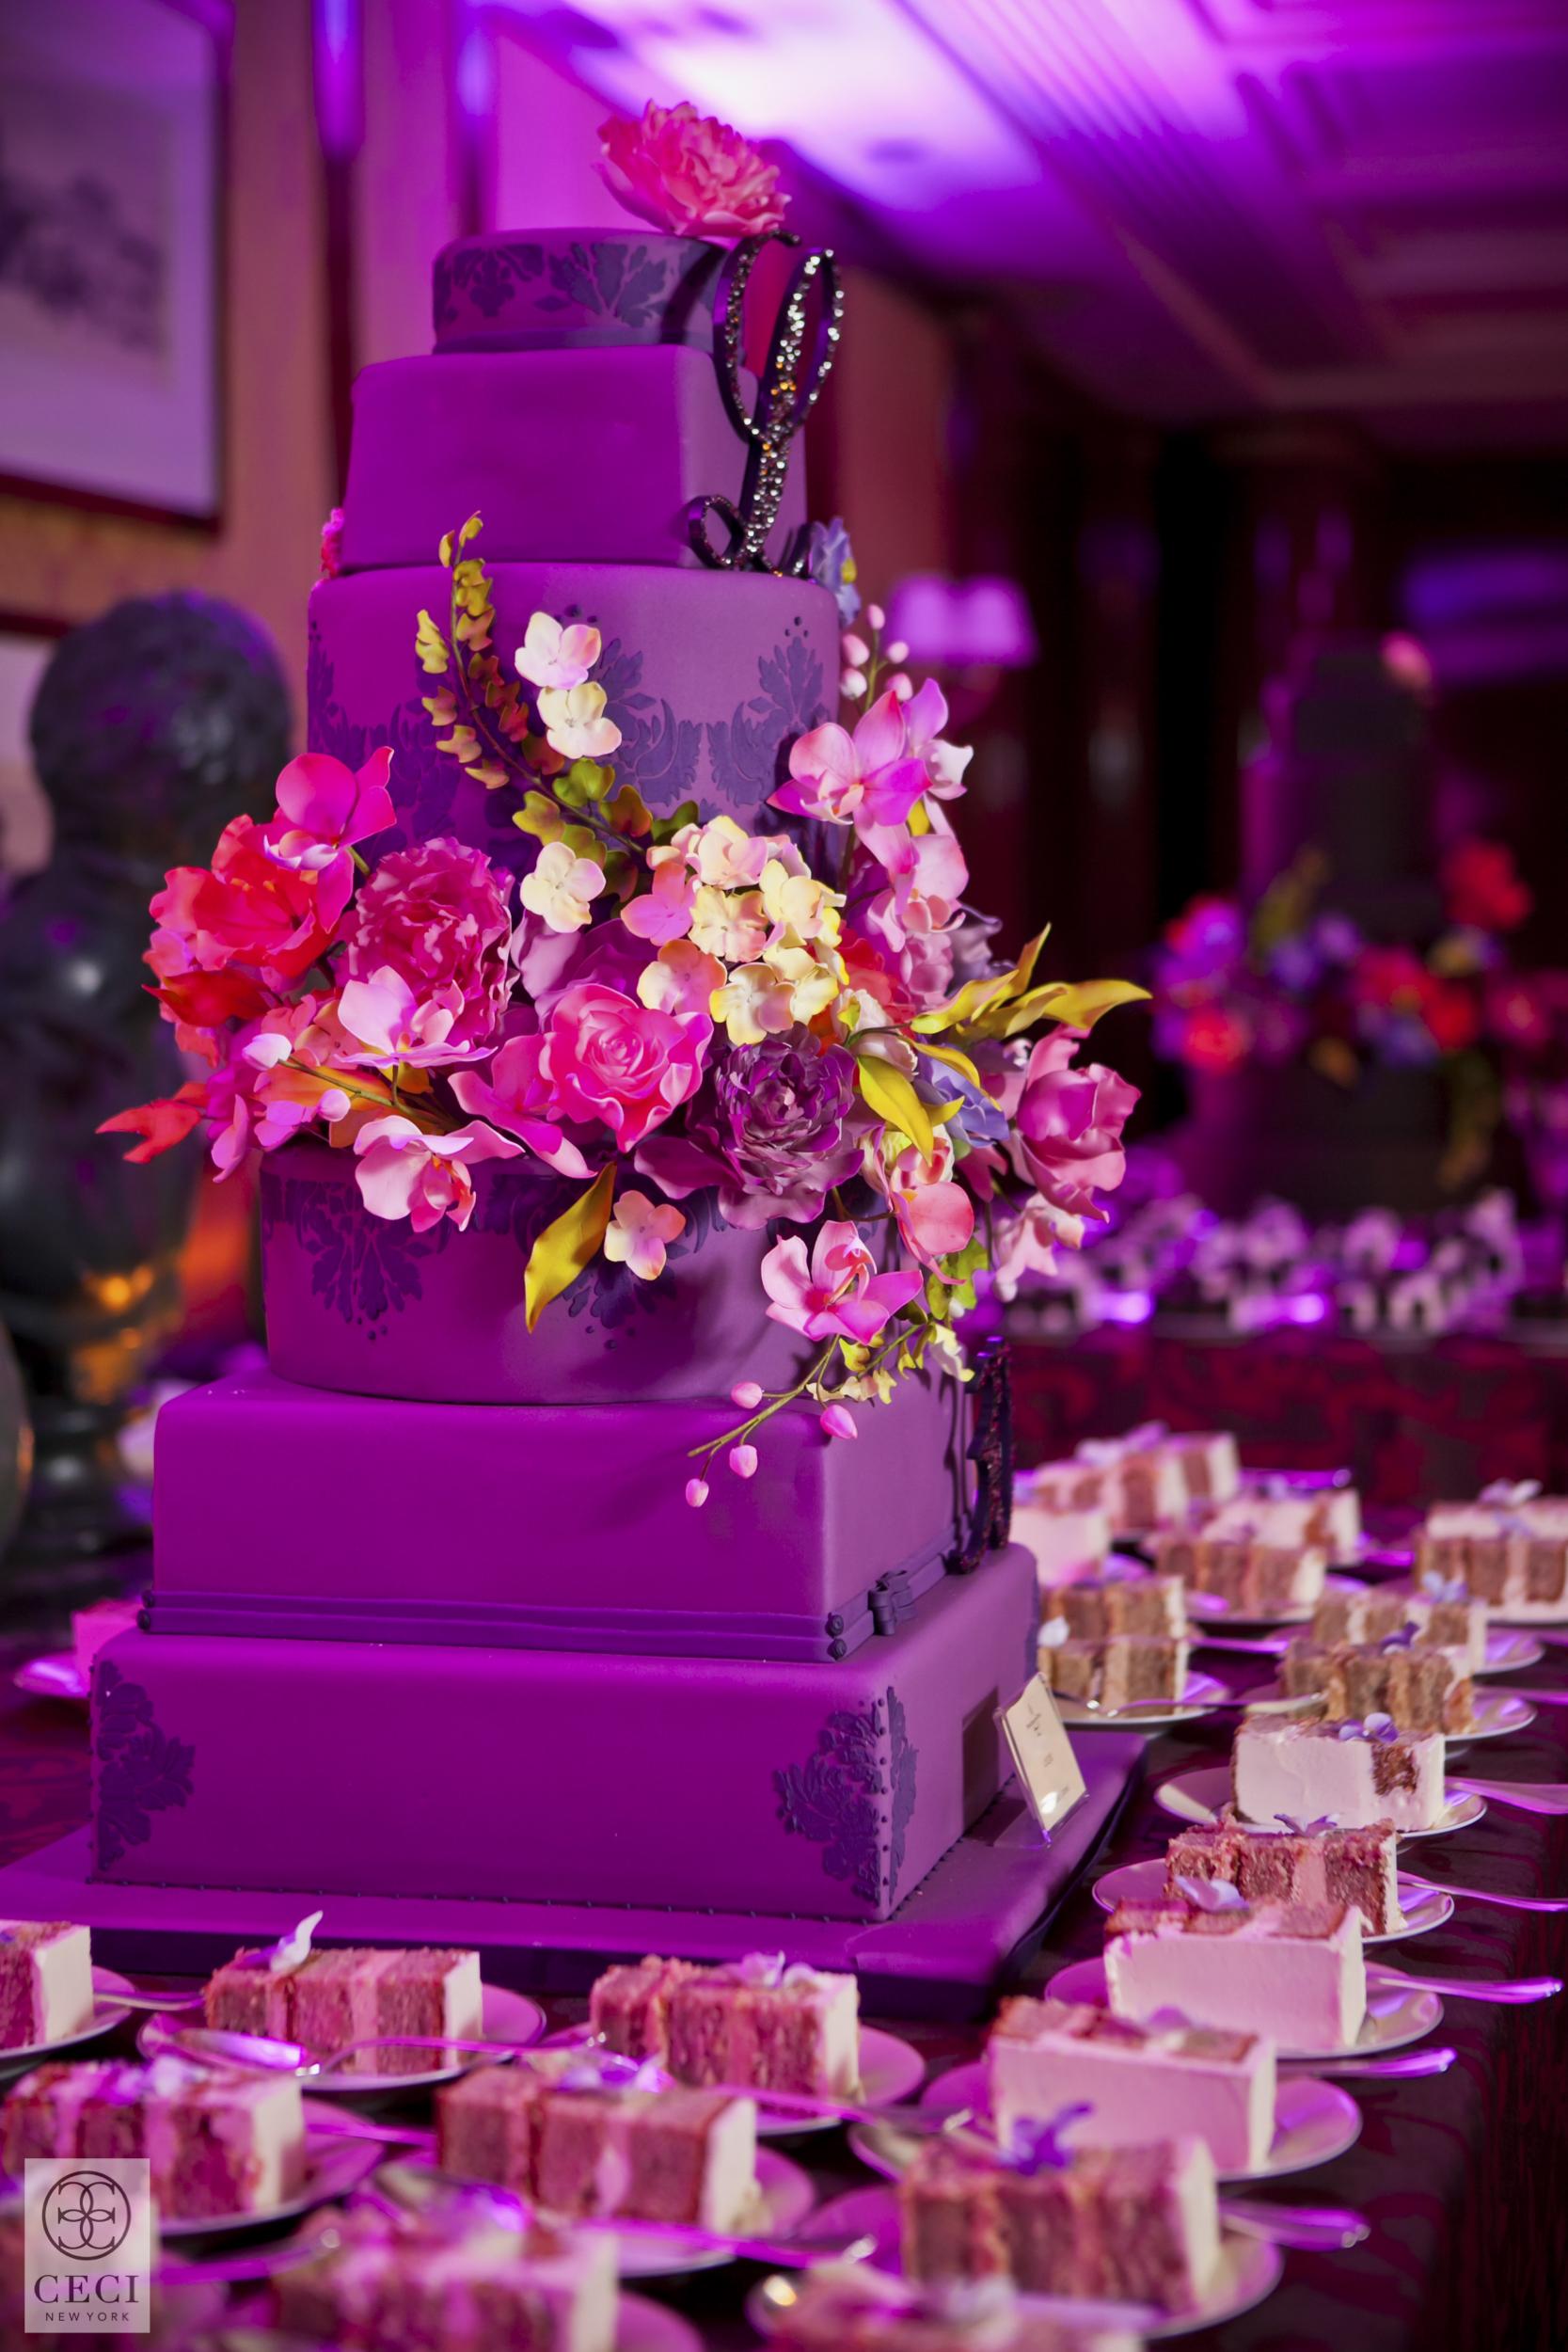 ceci_new_york_lucas_somoza_purple_regal_wediding_birthday_commitment_ceremony_gold-39.jpg